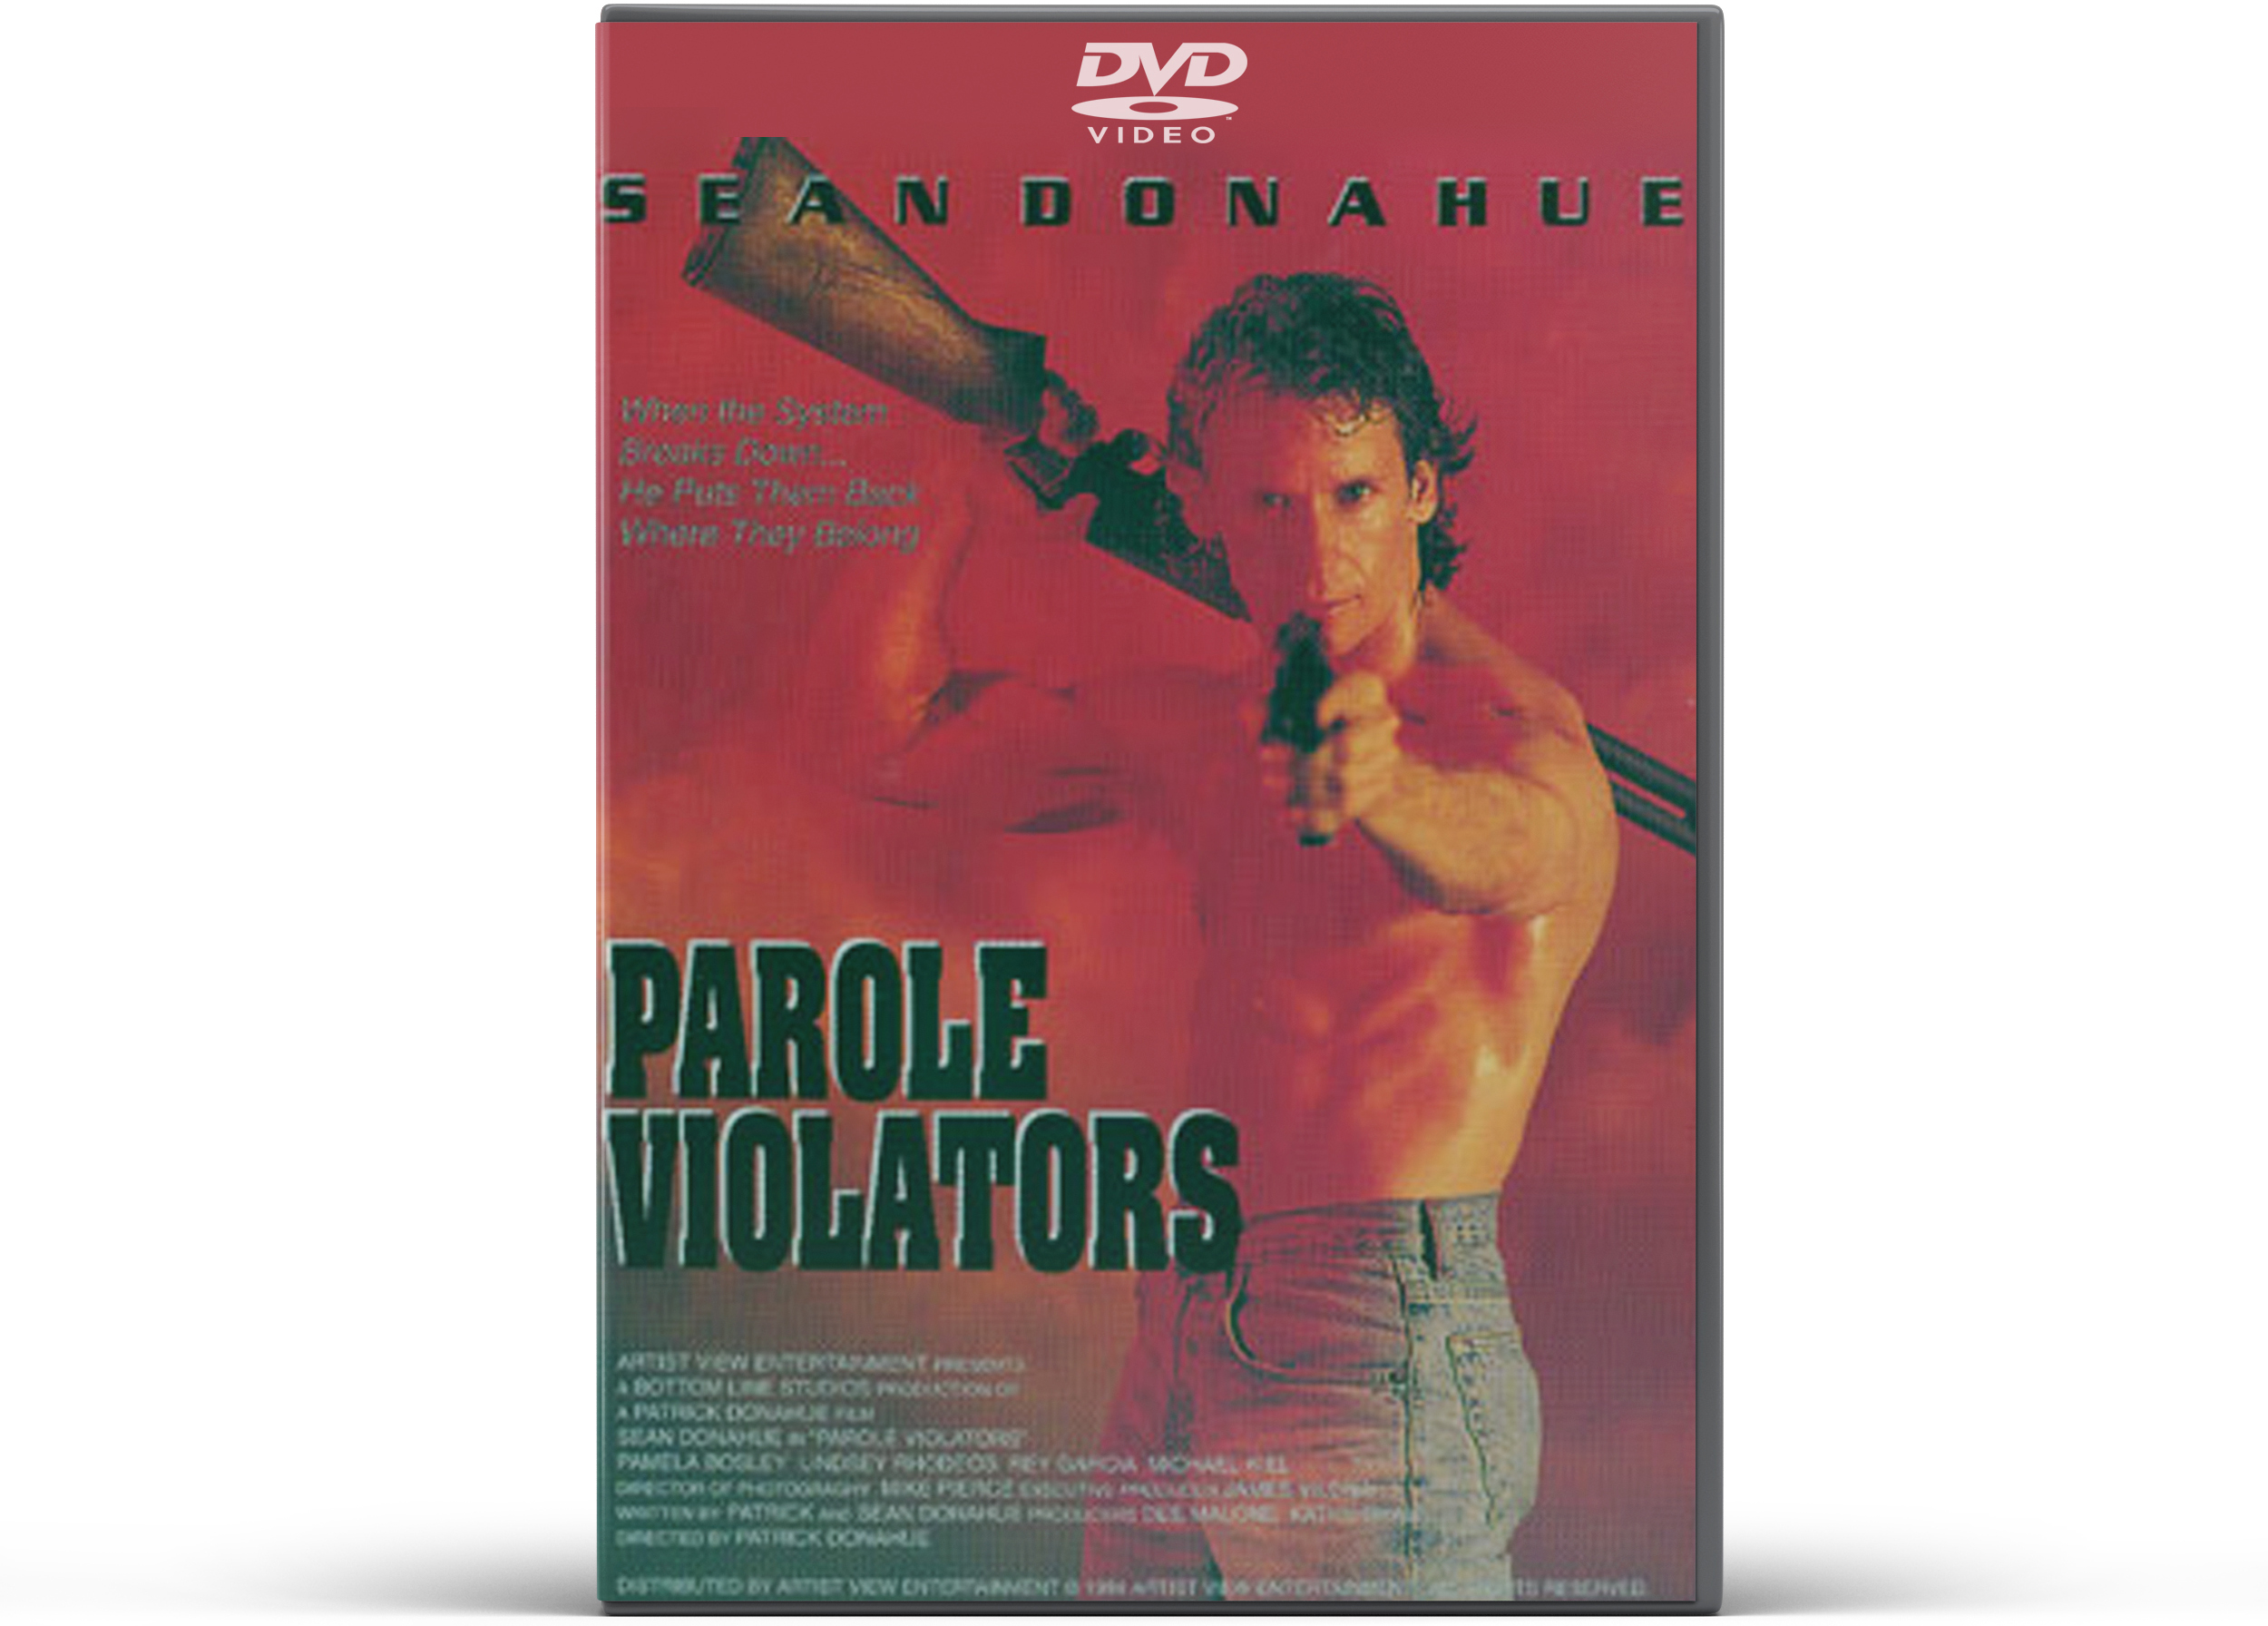 Parole Violators DVD (trimmed).jpg